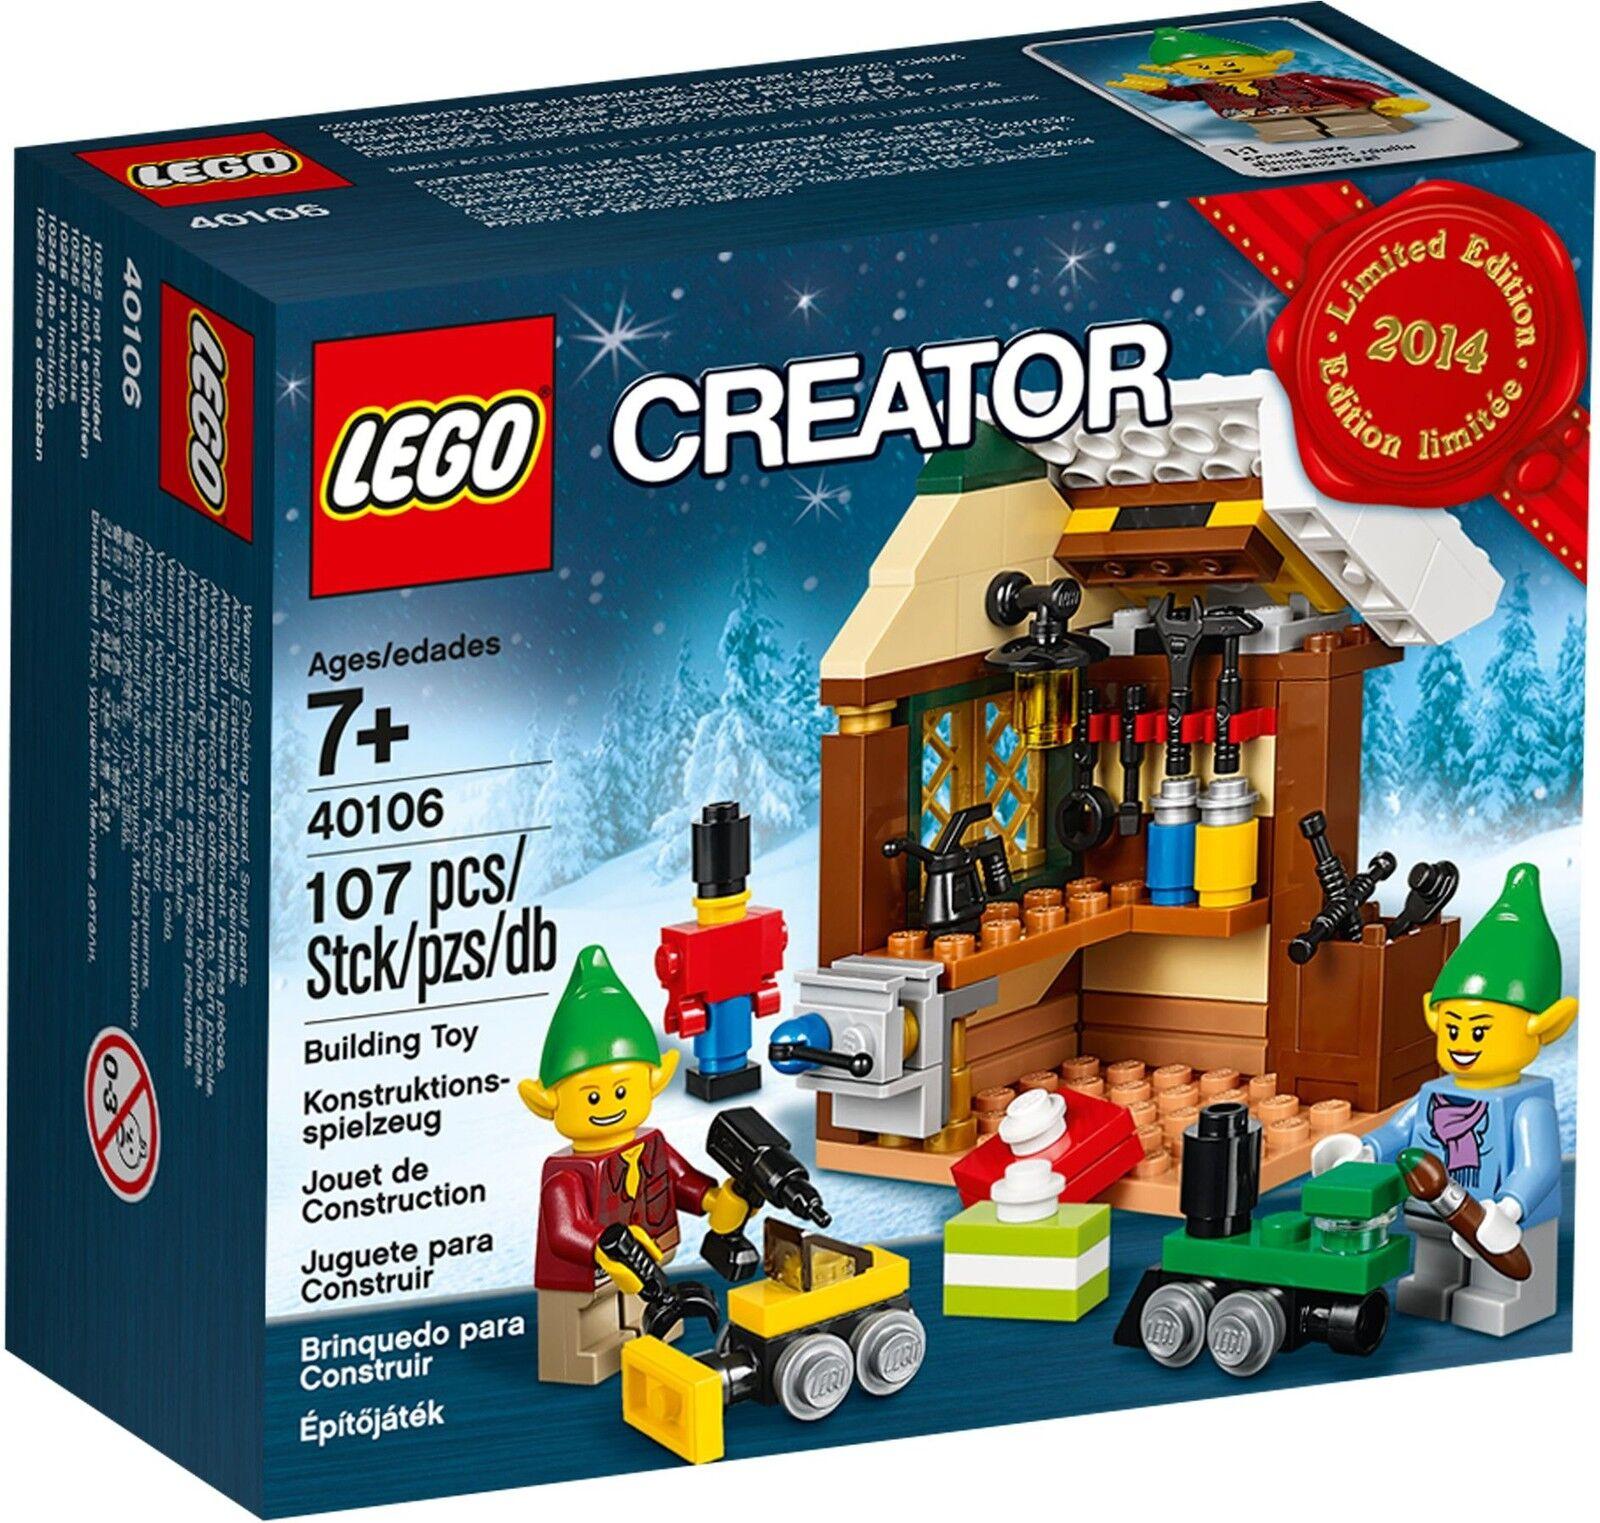 LEGO ® Creator 40106 GIOCATTOLI-OFFICINA NUOVO OVP _ TOY workshop NEW MISB NRFB 40083